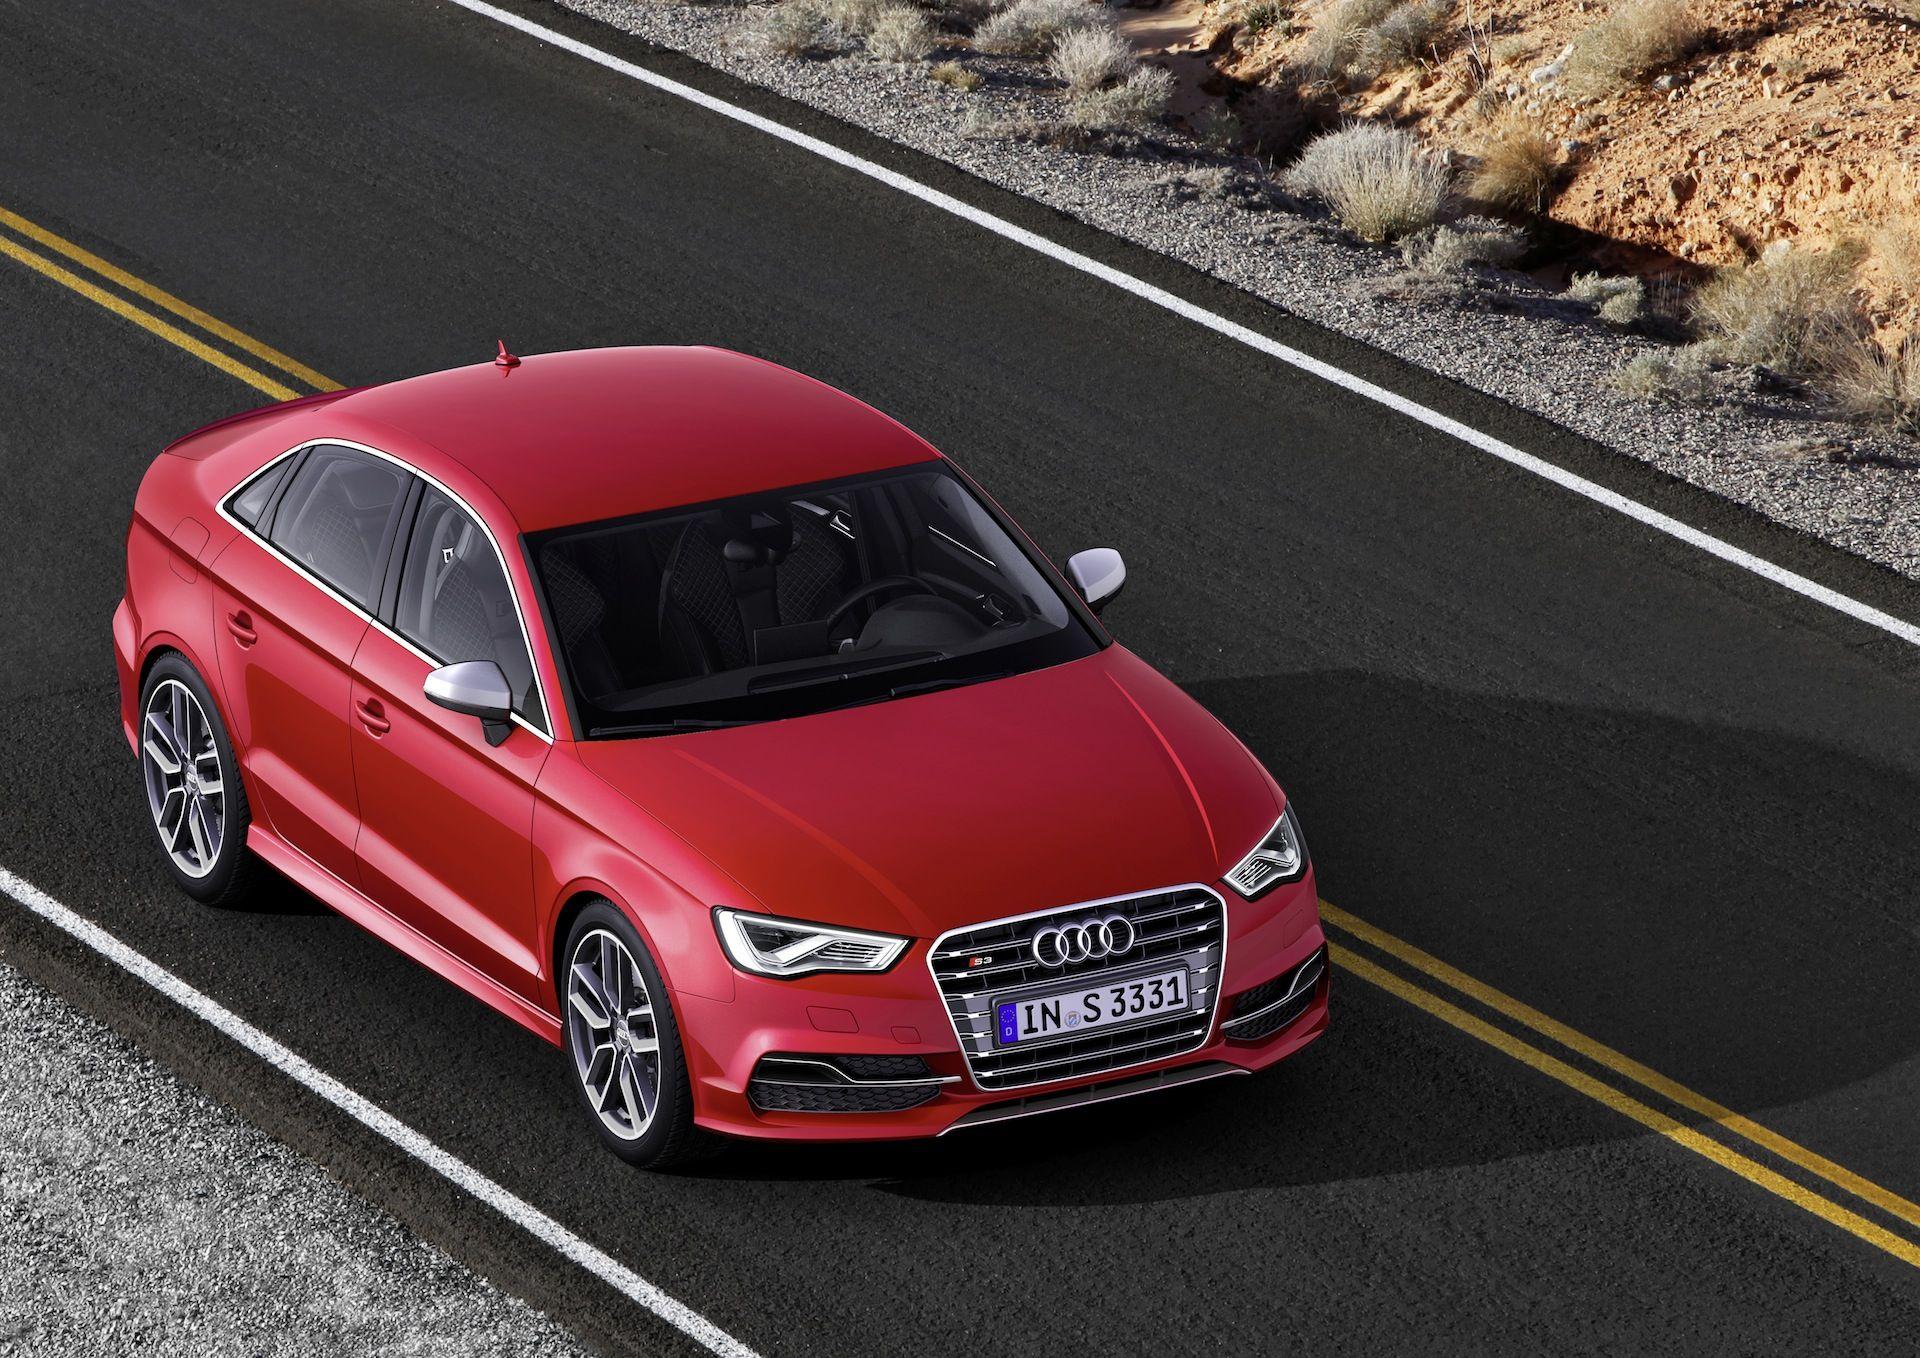 Audi sales top 1 57 million units in 2013